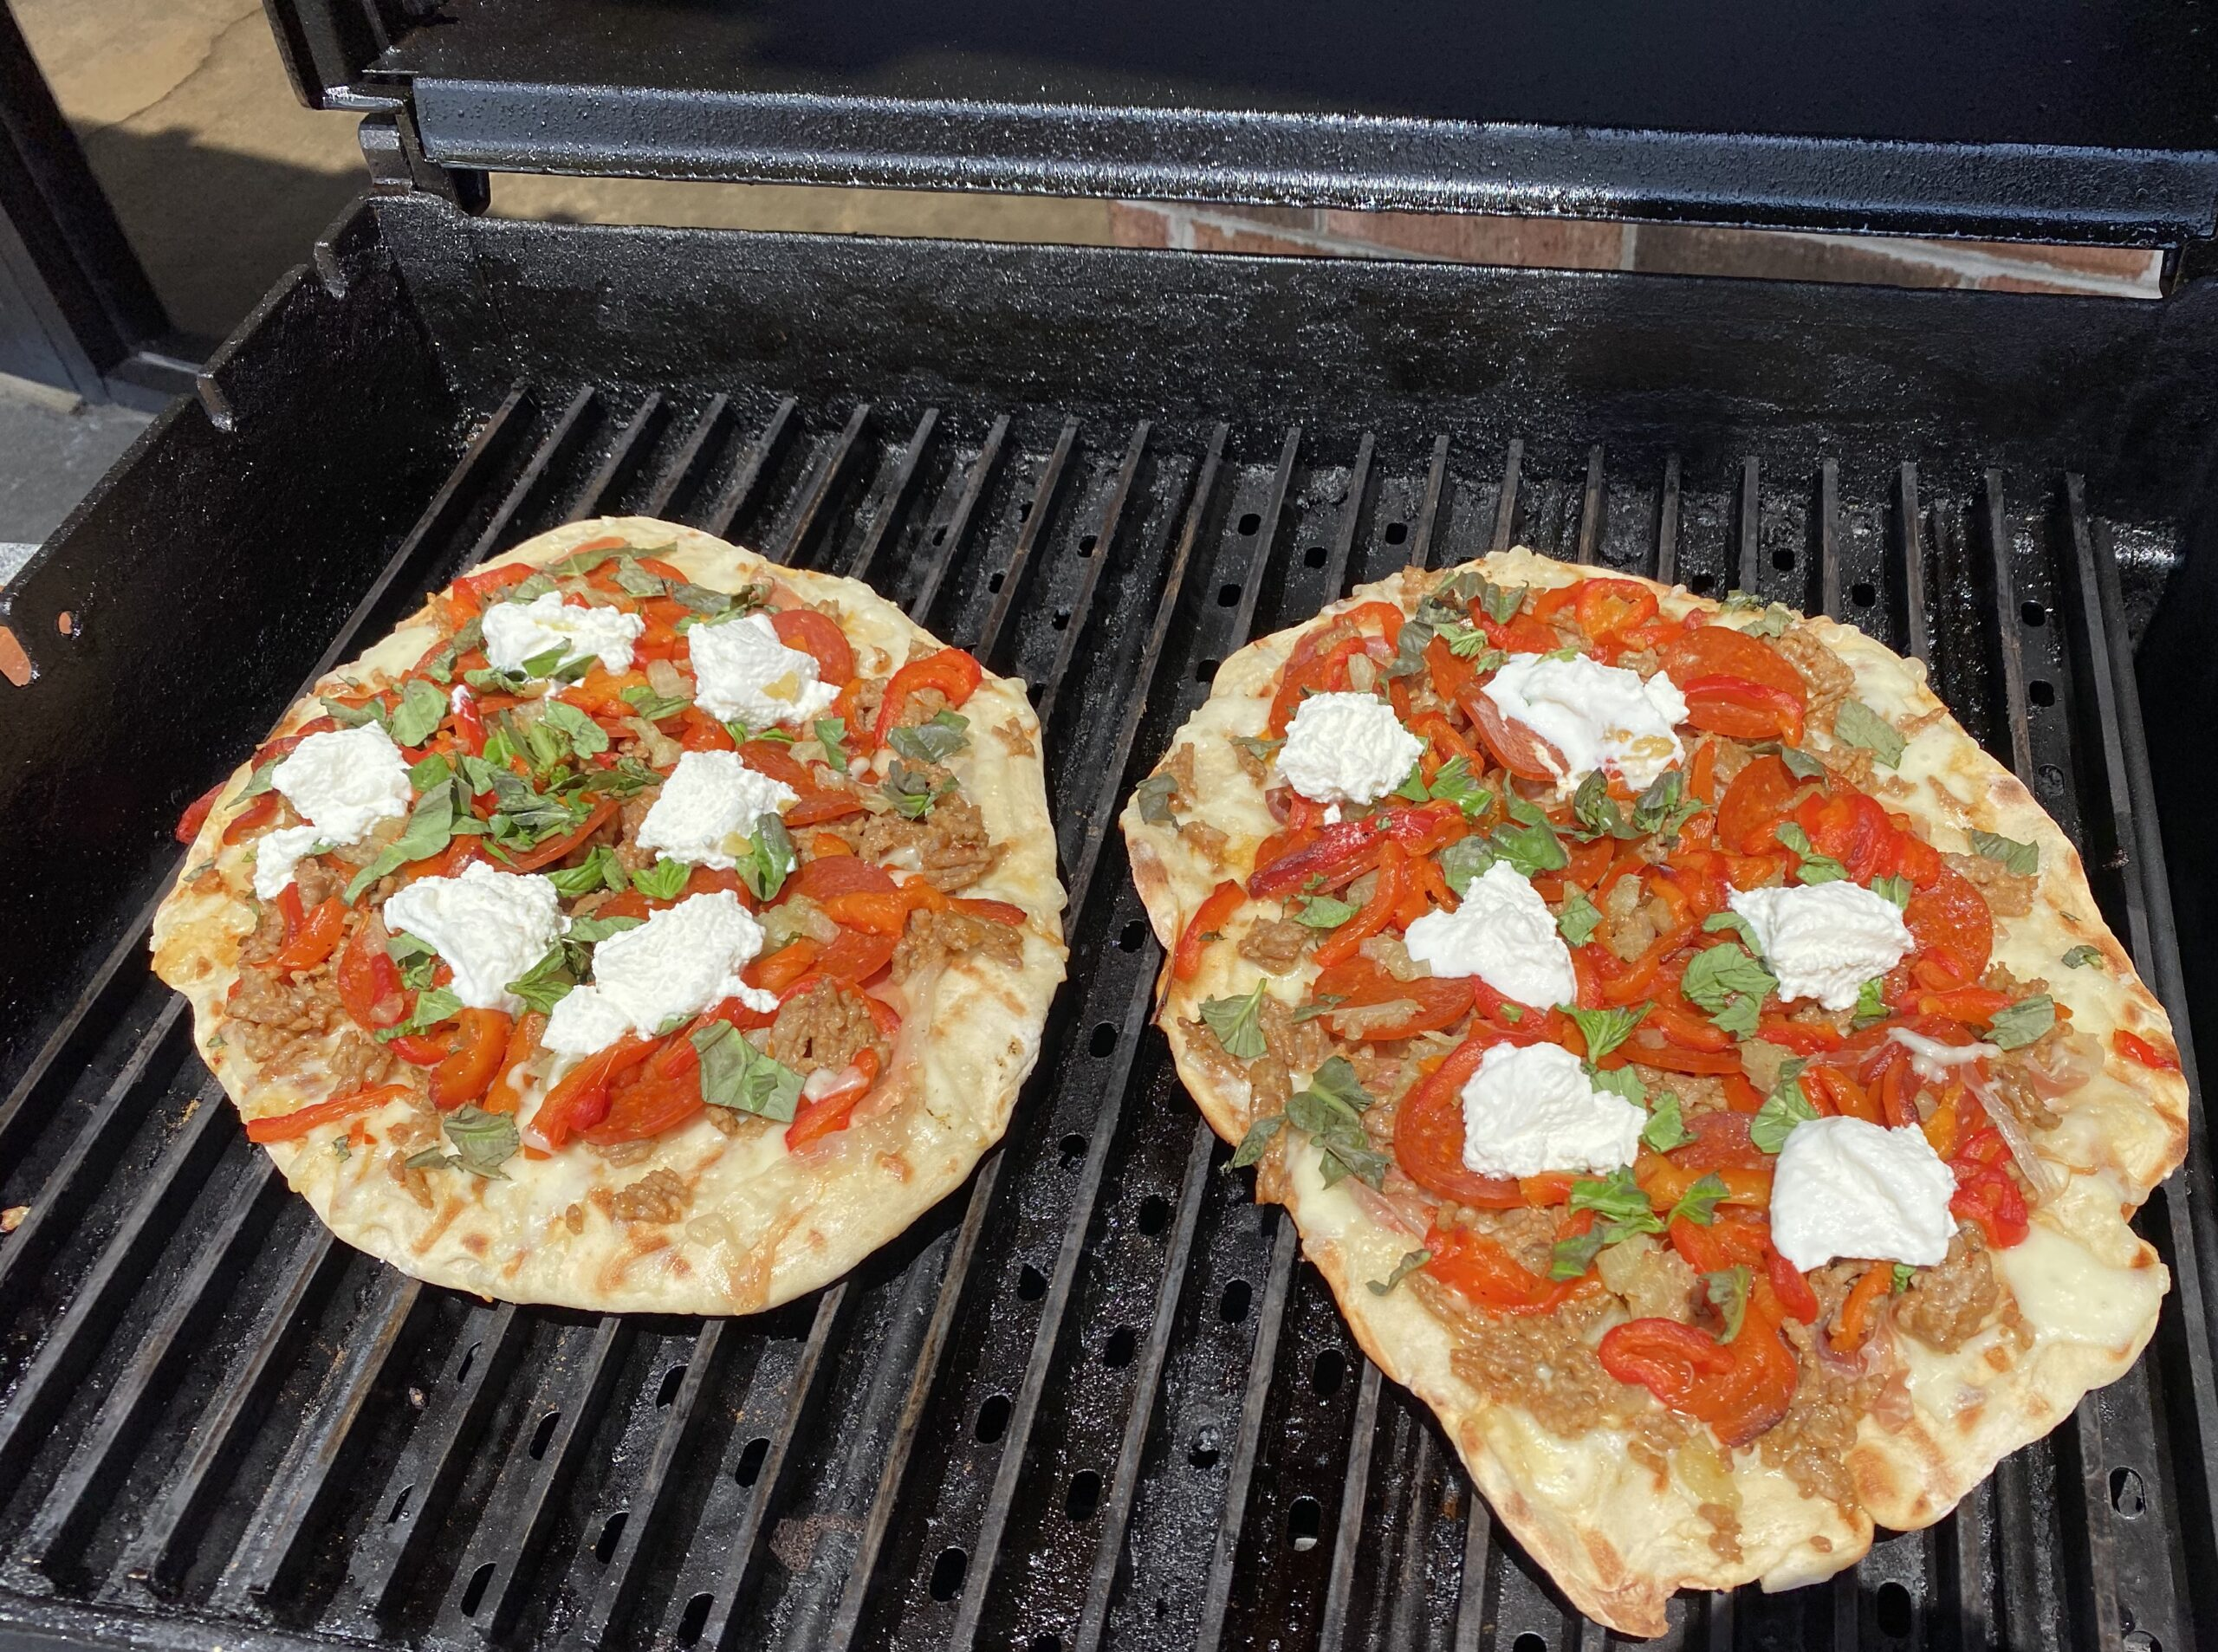 The Don Framptonio Pizza